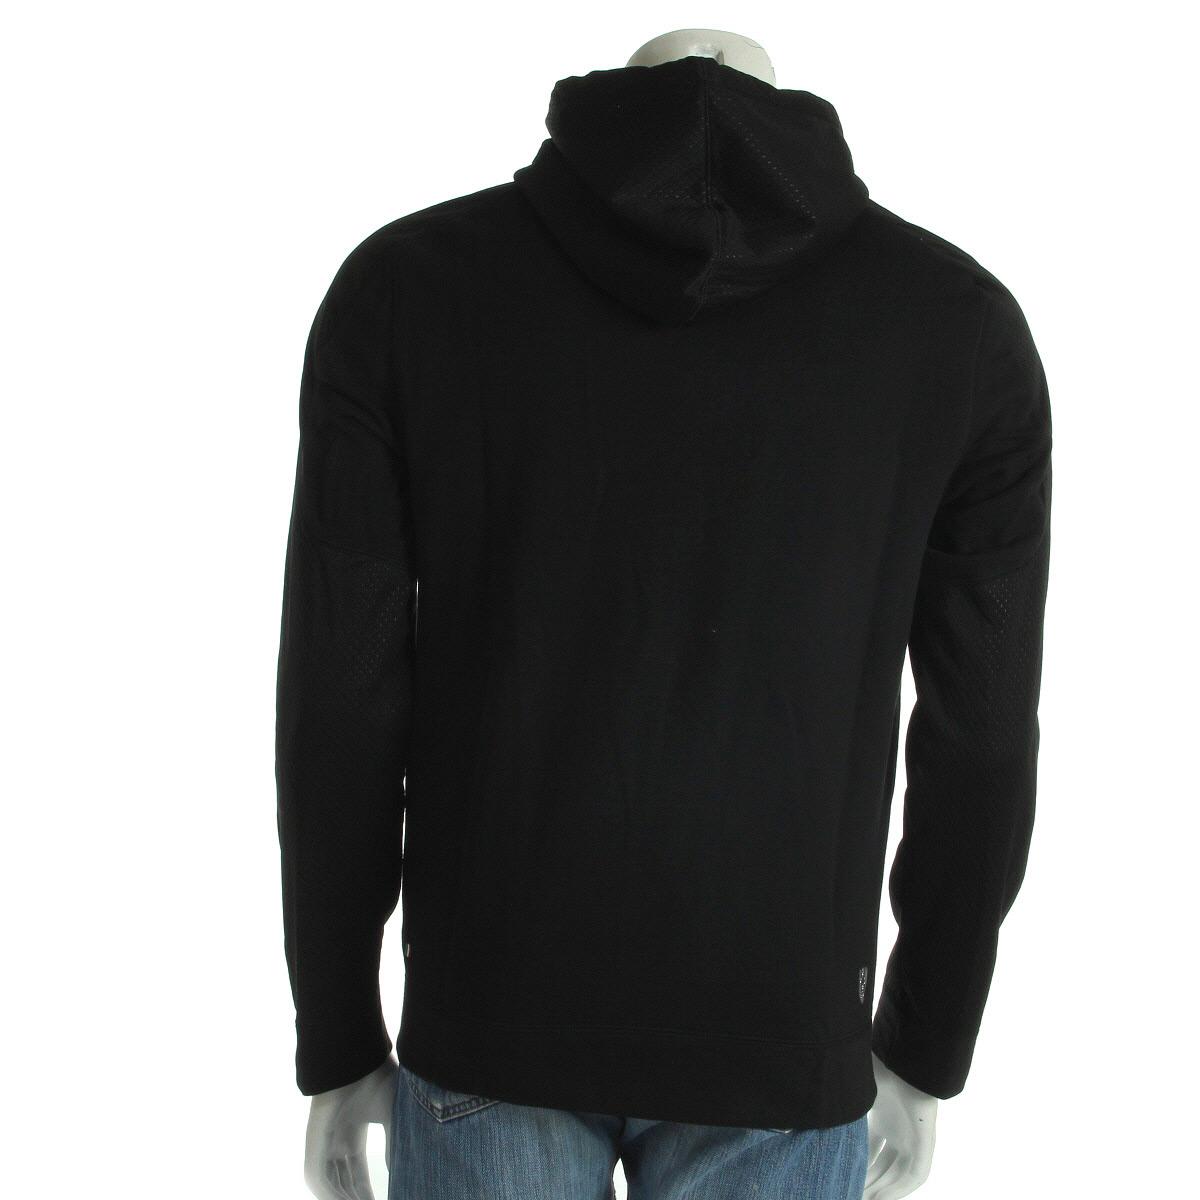 puma ferrari hooded sweat jacket 56842701 vestes sport homme. Black Bedroom Furniture Sets. Home Design Ideas